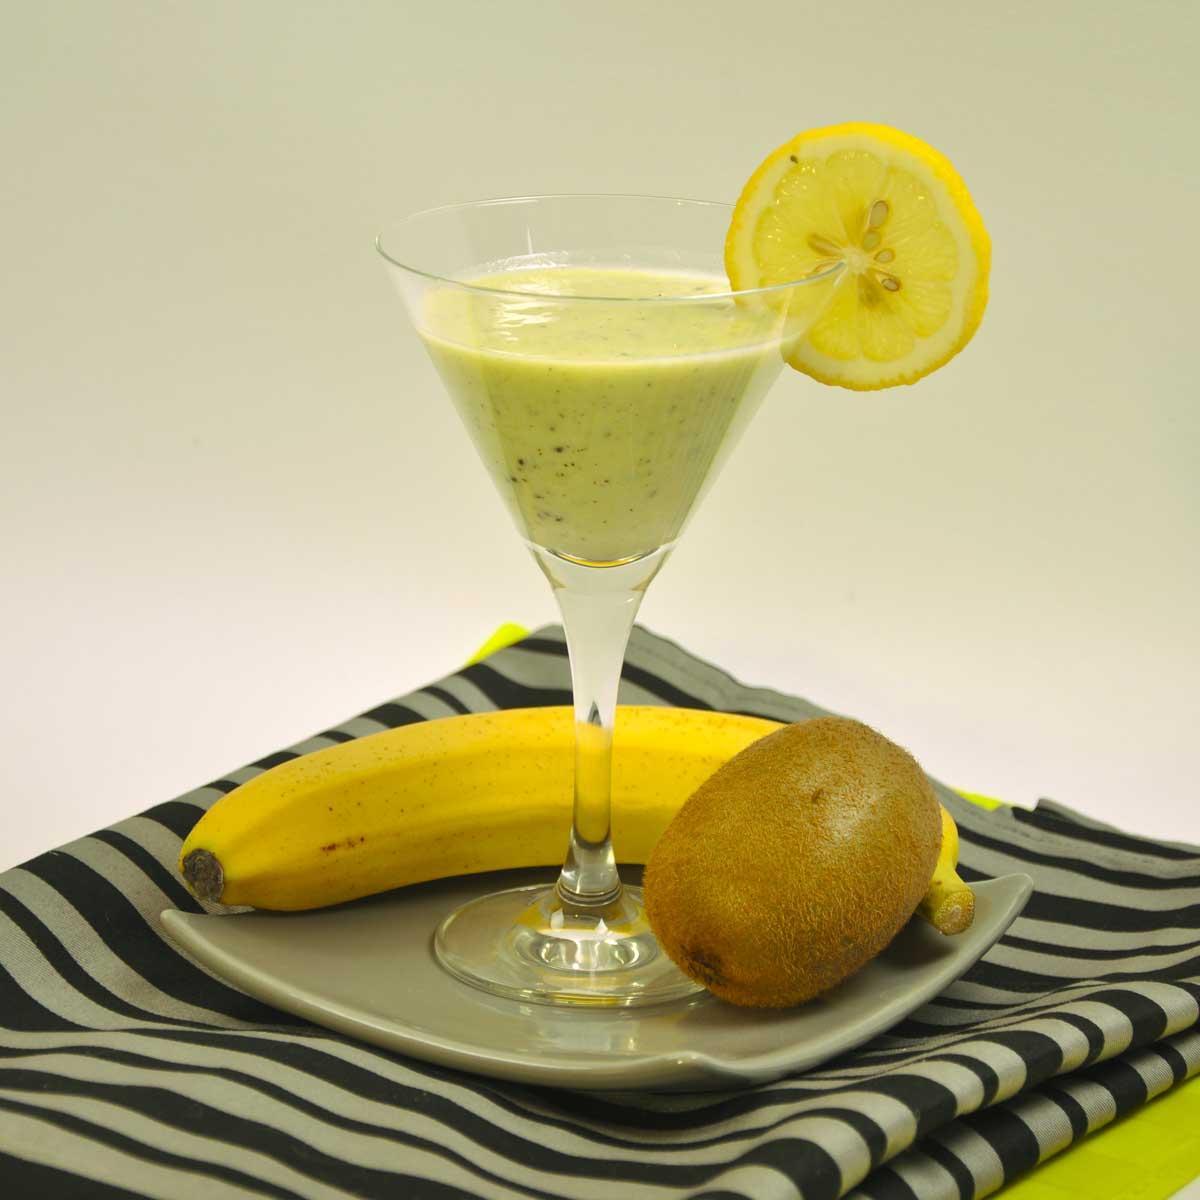 Recette Smoothie Banane Kiwi Cuisine Madame Figaro